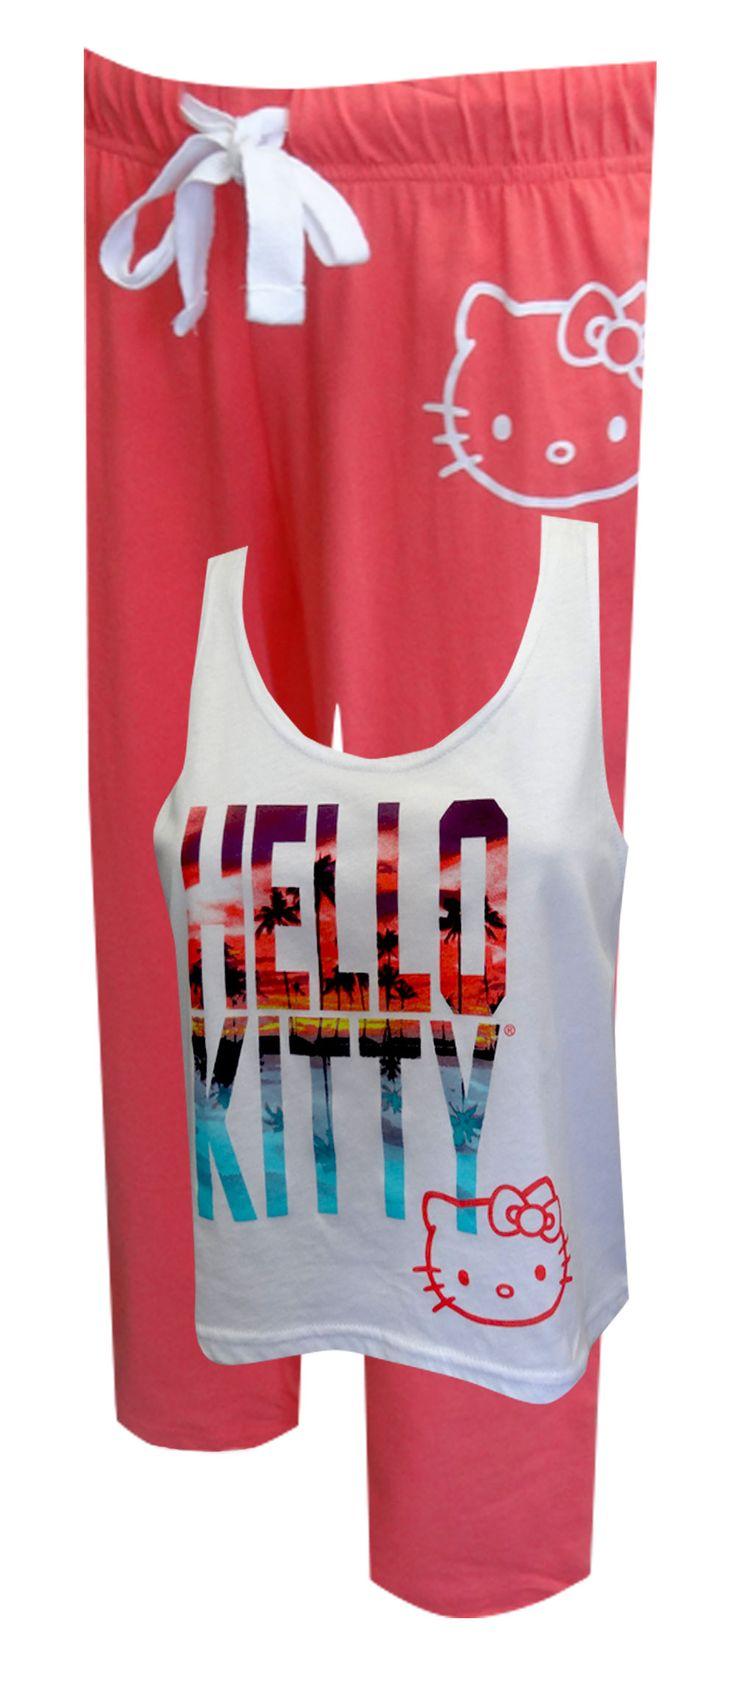 Design your own hello kitty t-shirt - Hello Kitty Caribbean Sunset Pajamas